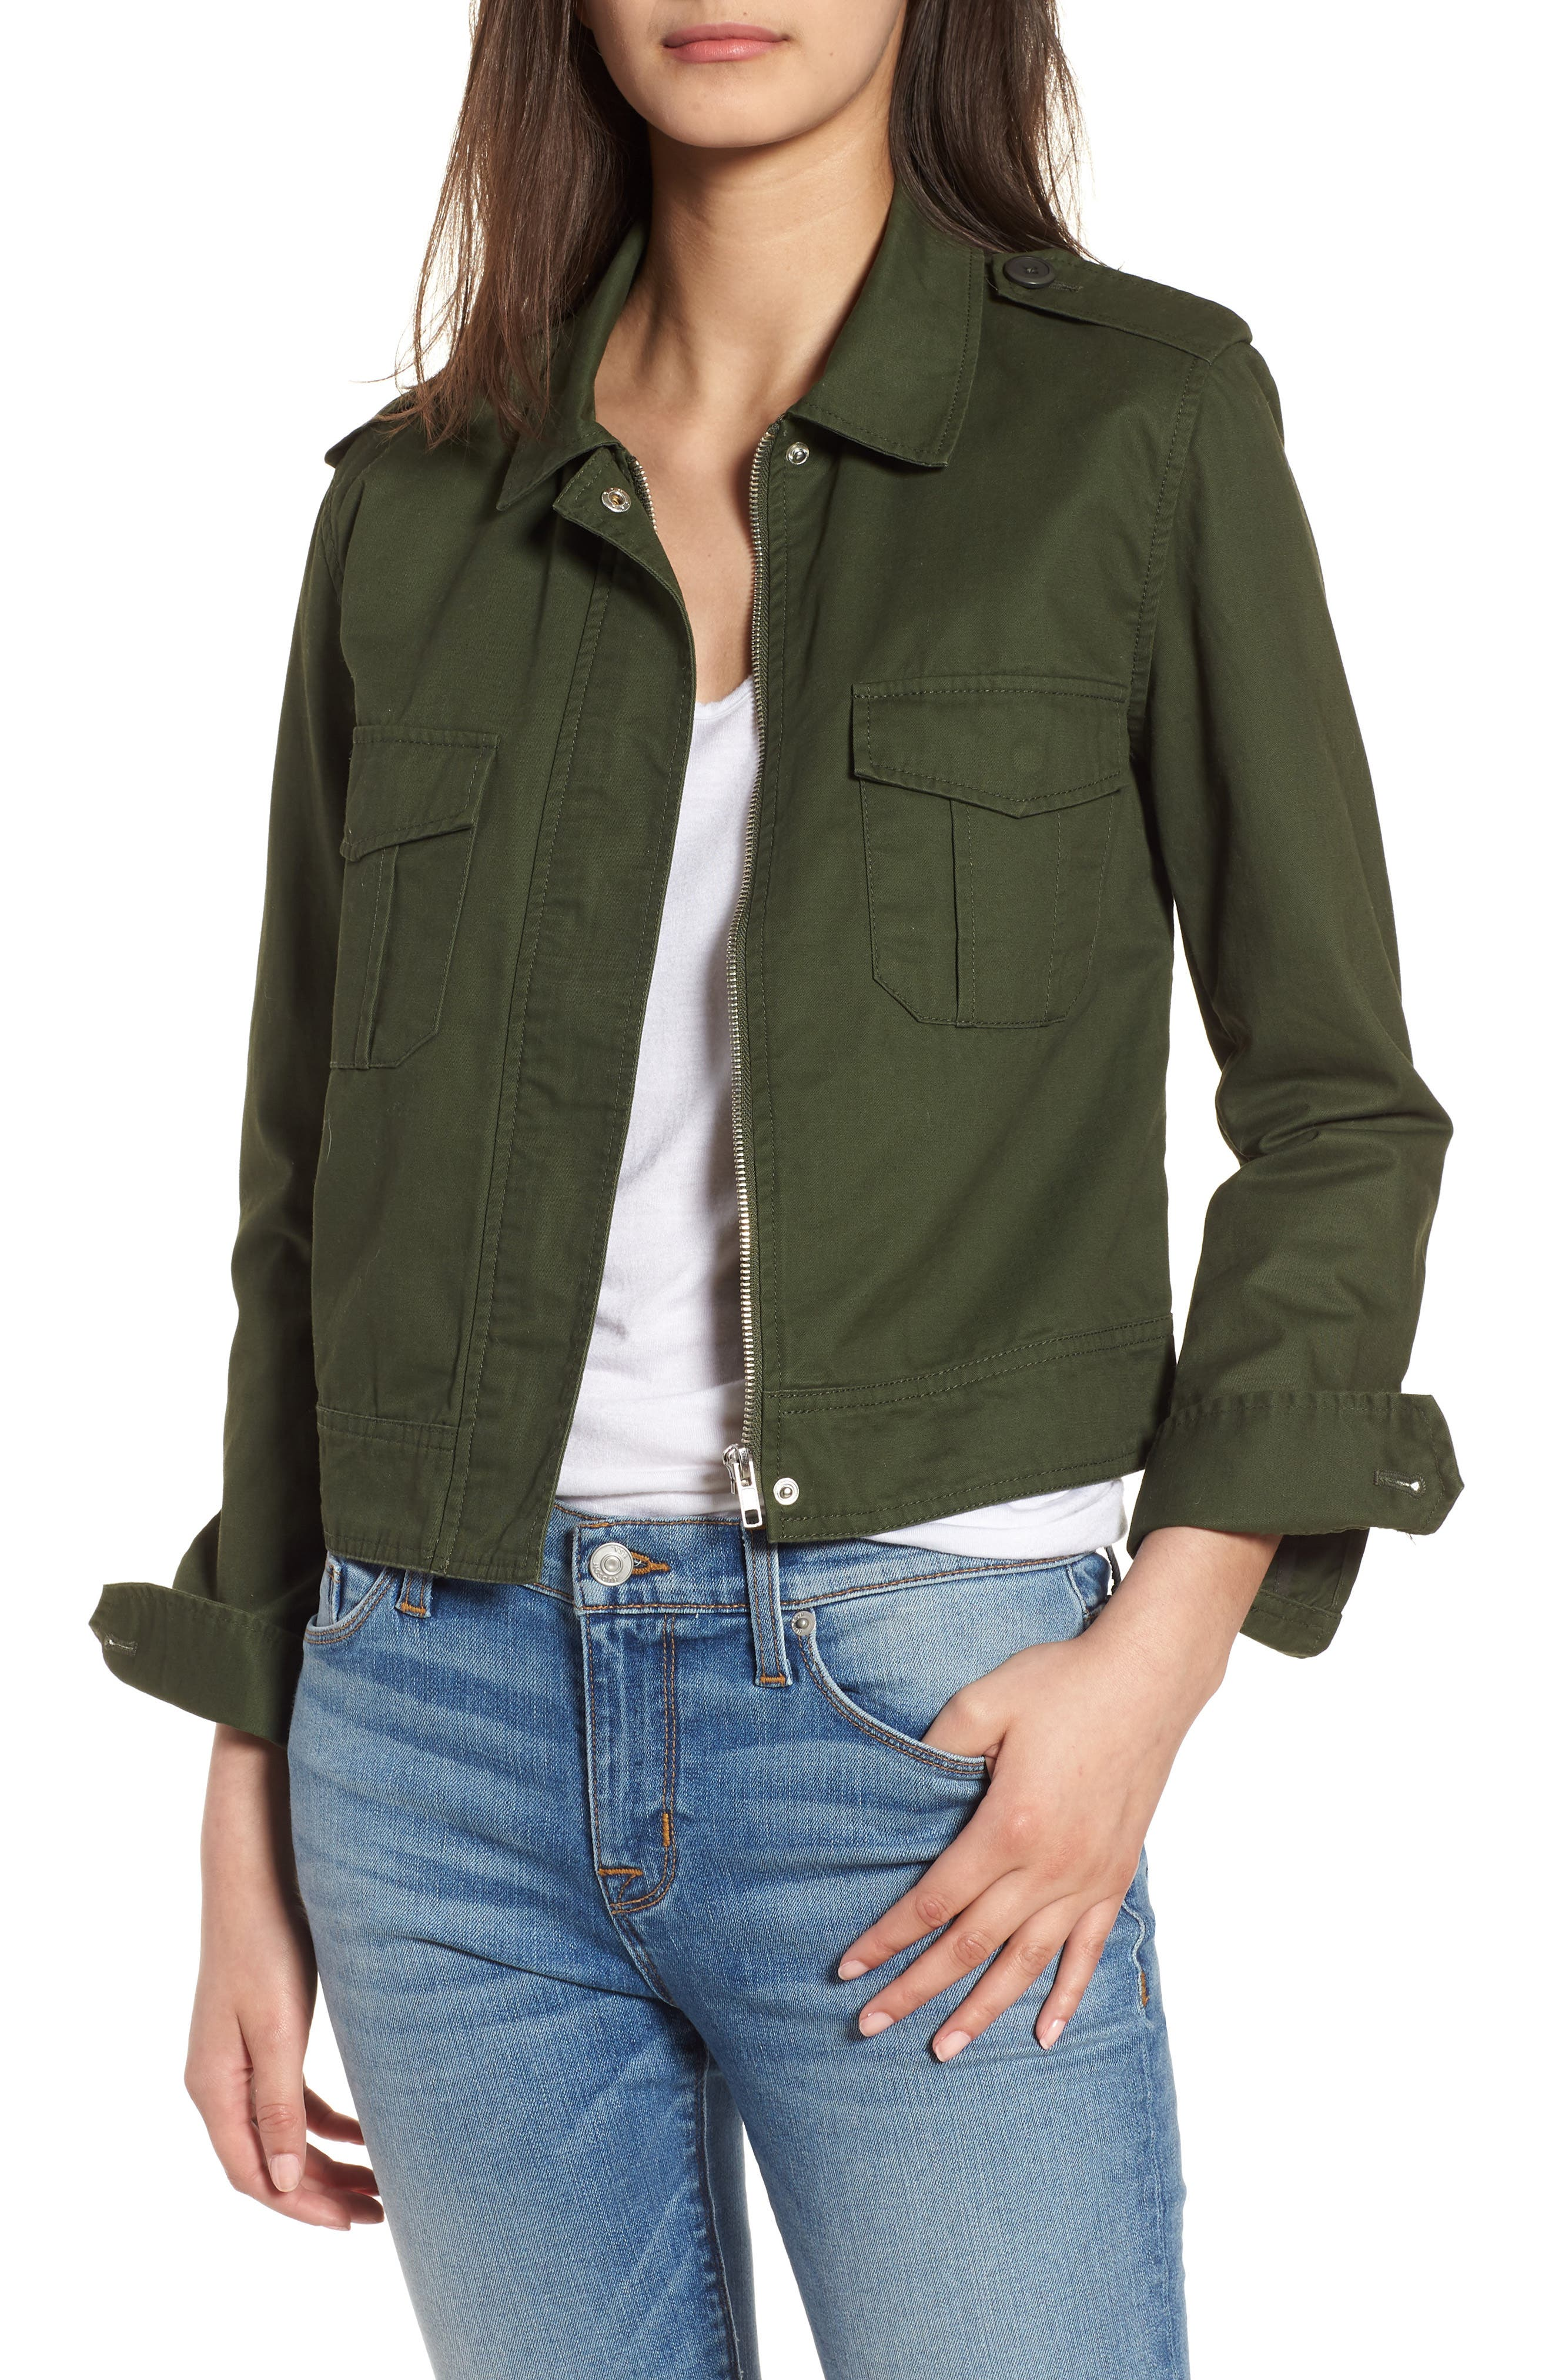 Maddox Cotton Twill Army Jacket, Main, color, 301